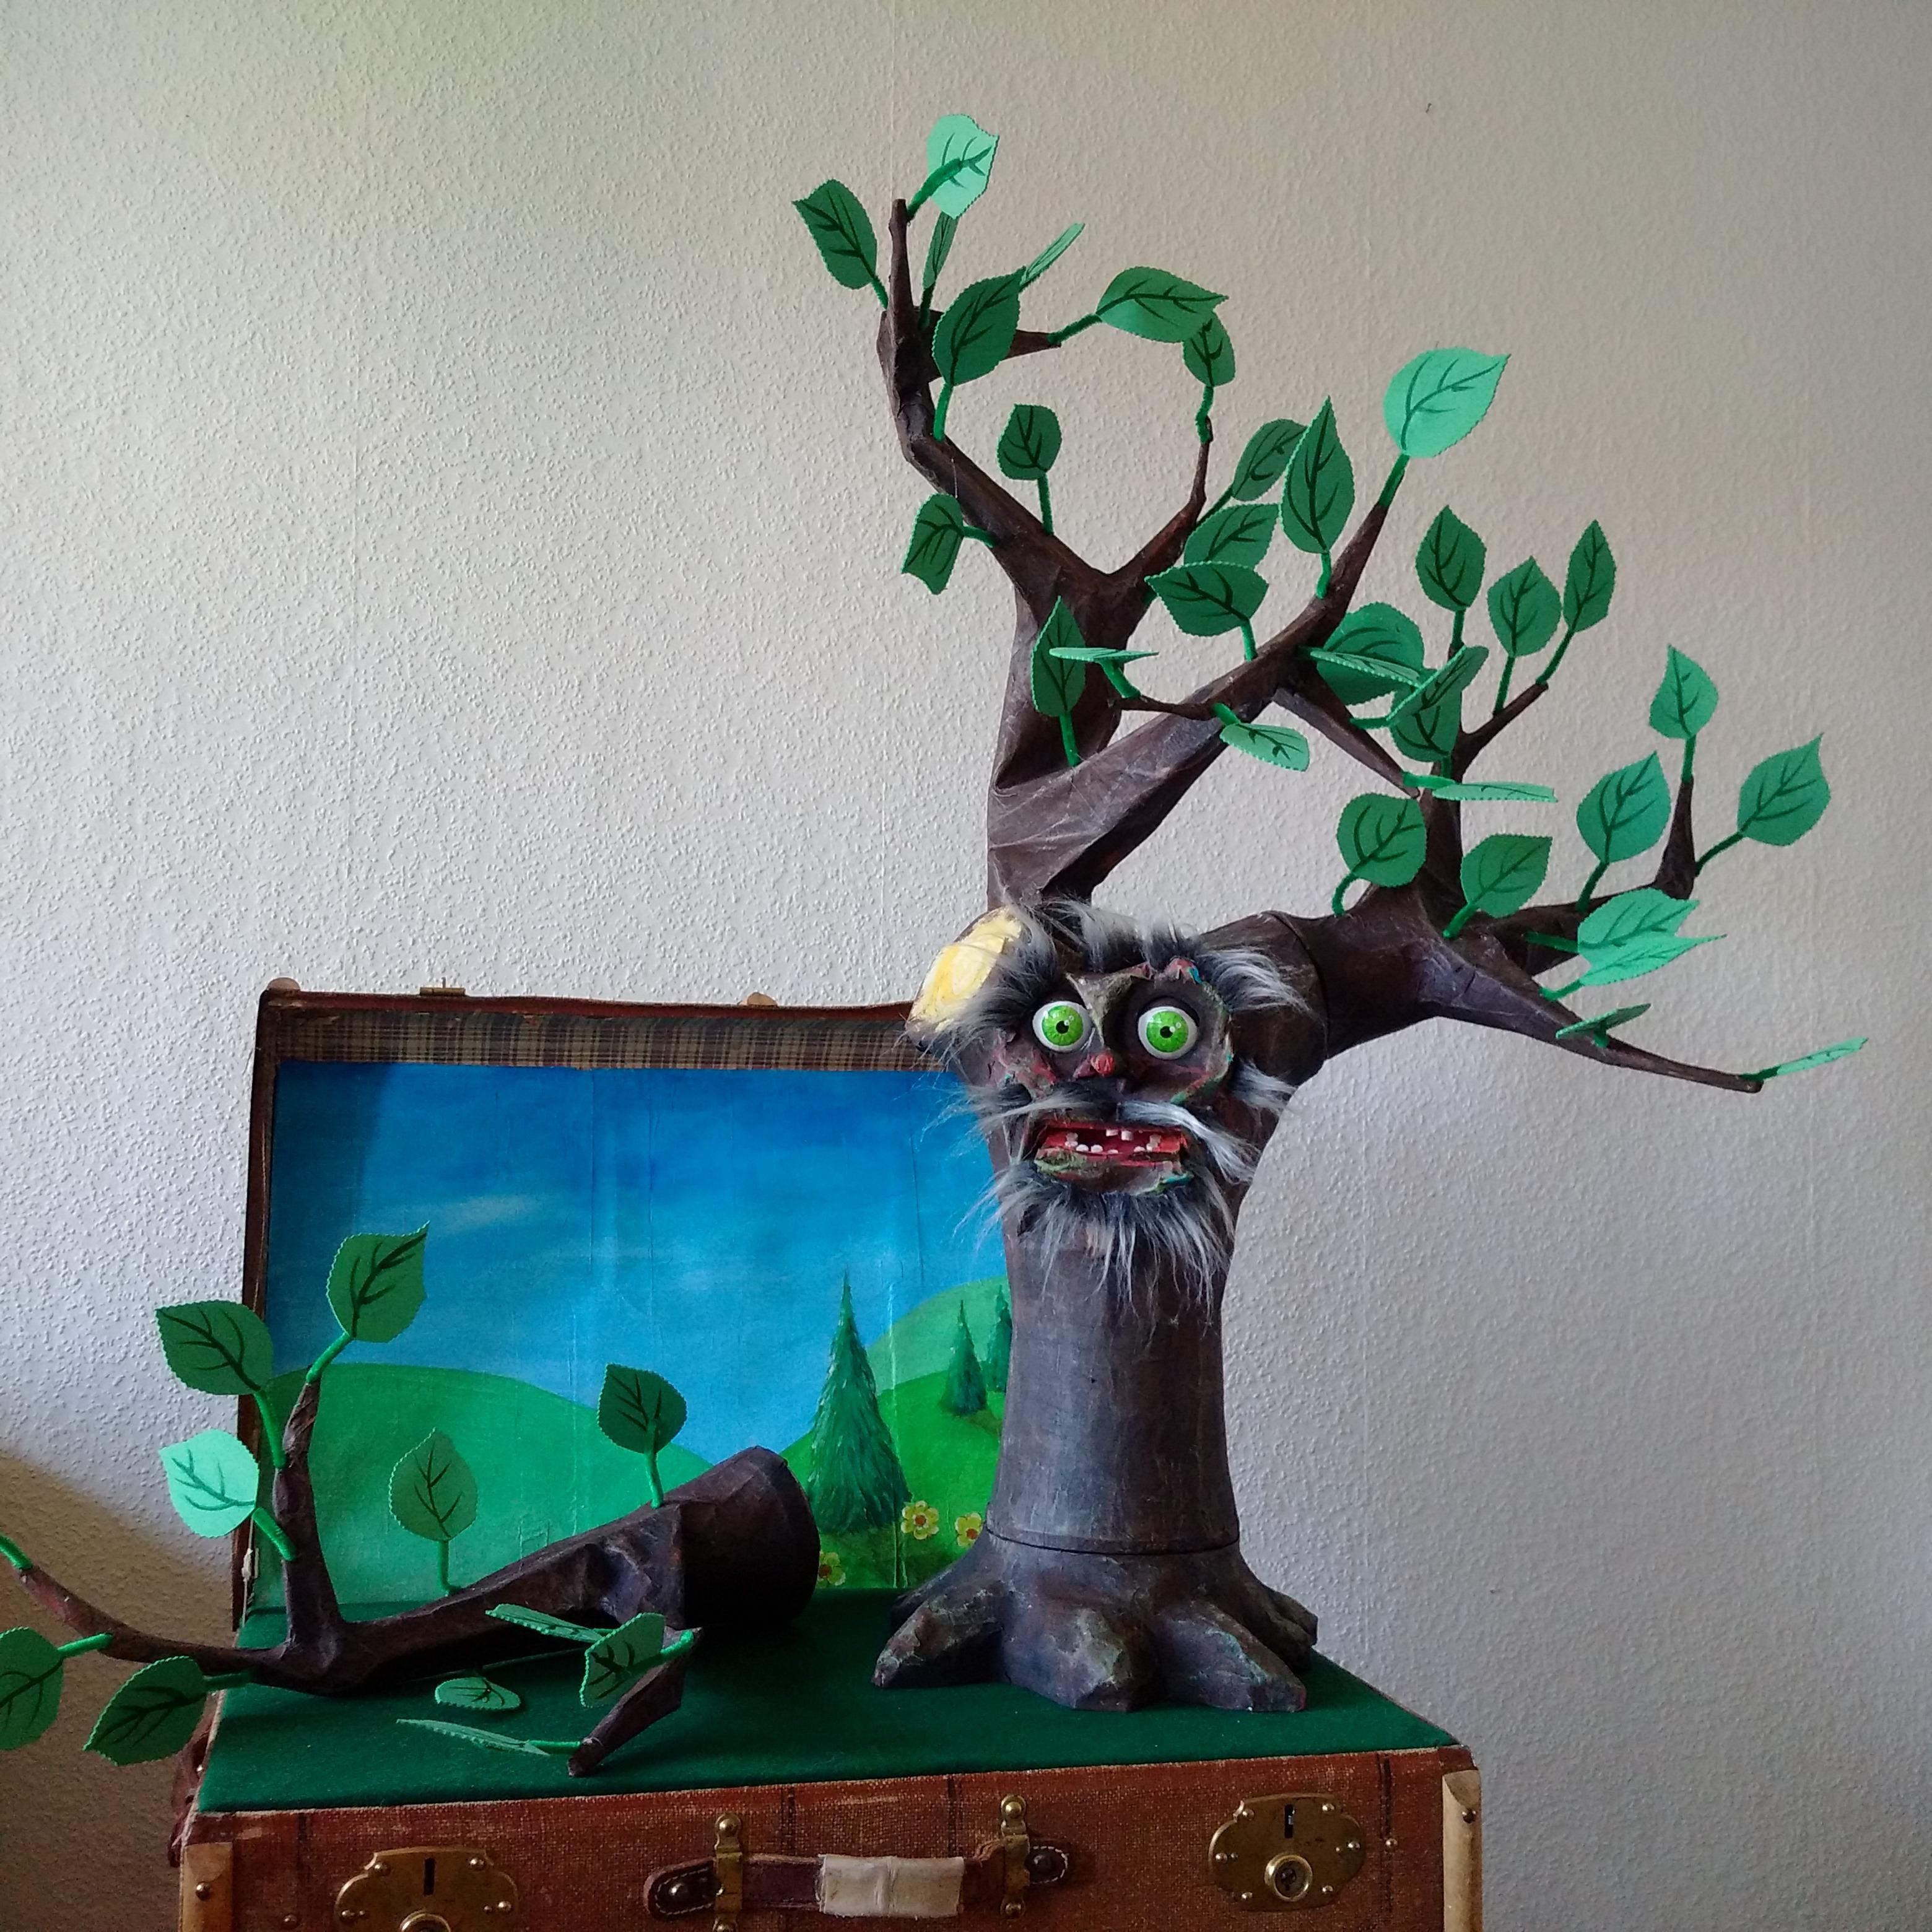 Das Großzügige Baum - The Giving Tree, puppet